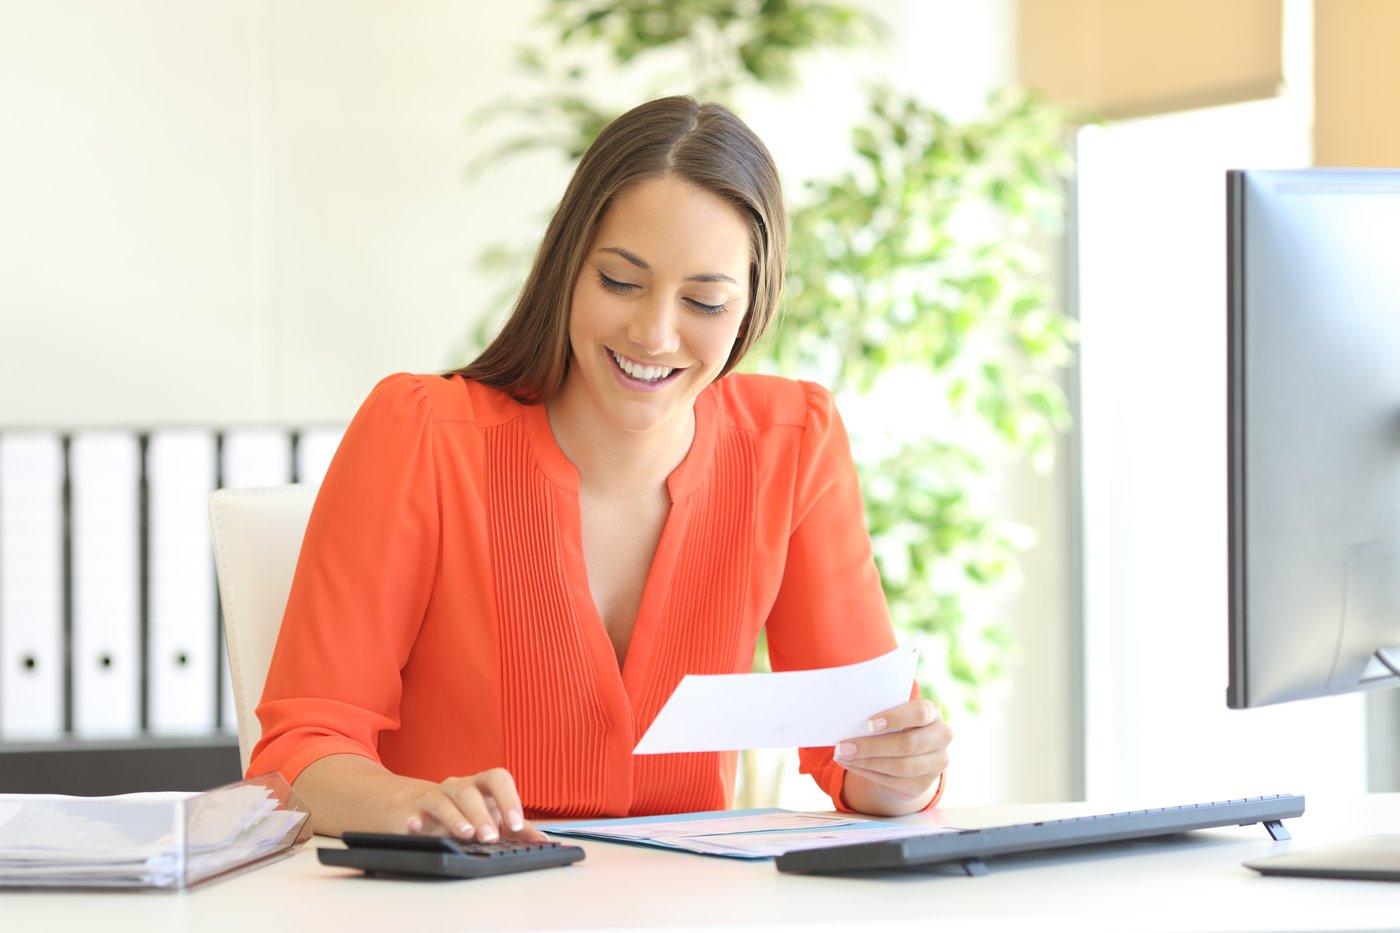 How to Make Budgeting on an Irregular Income Easy